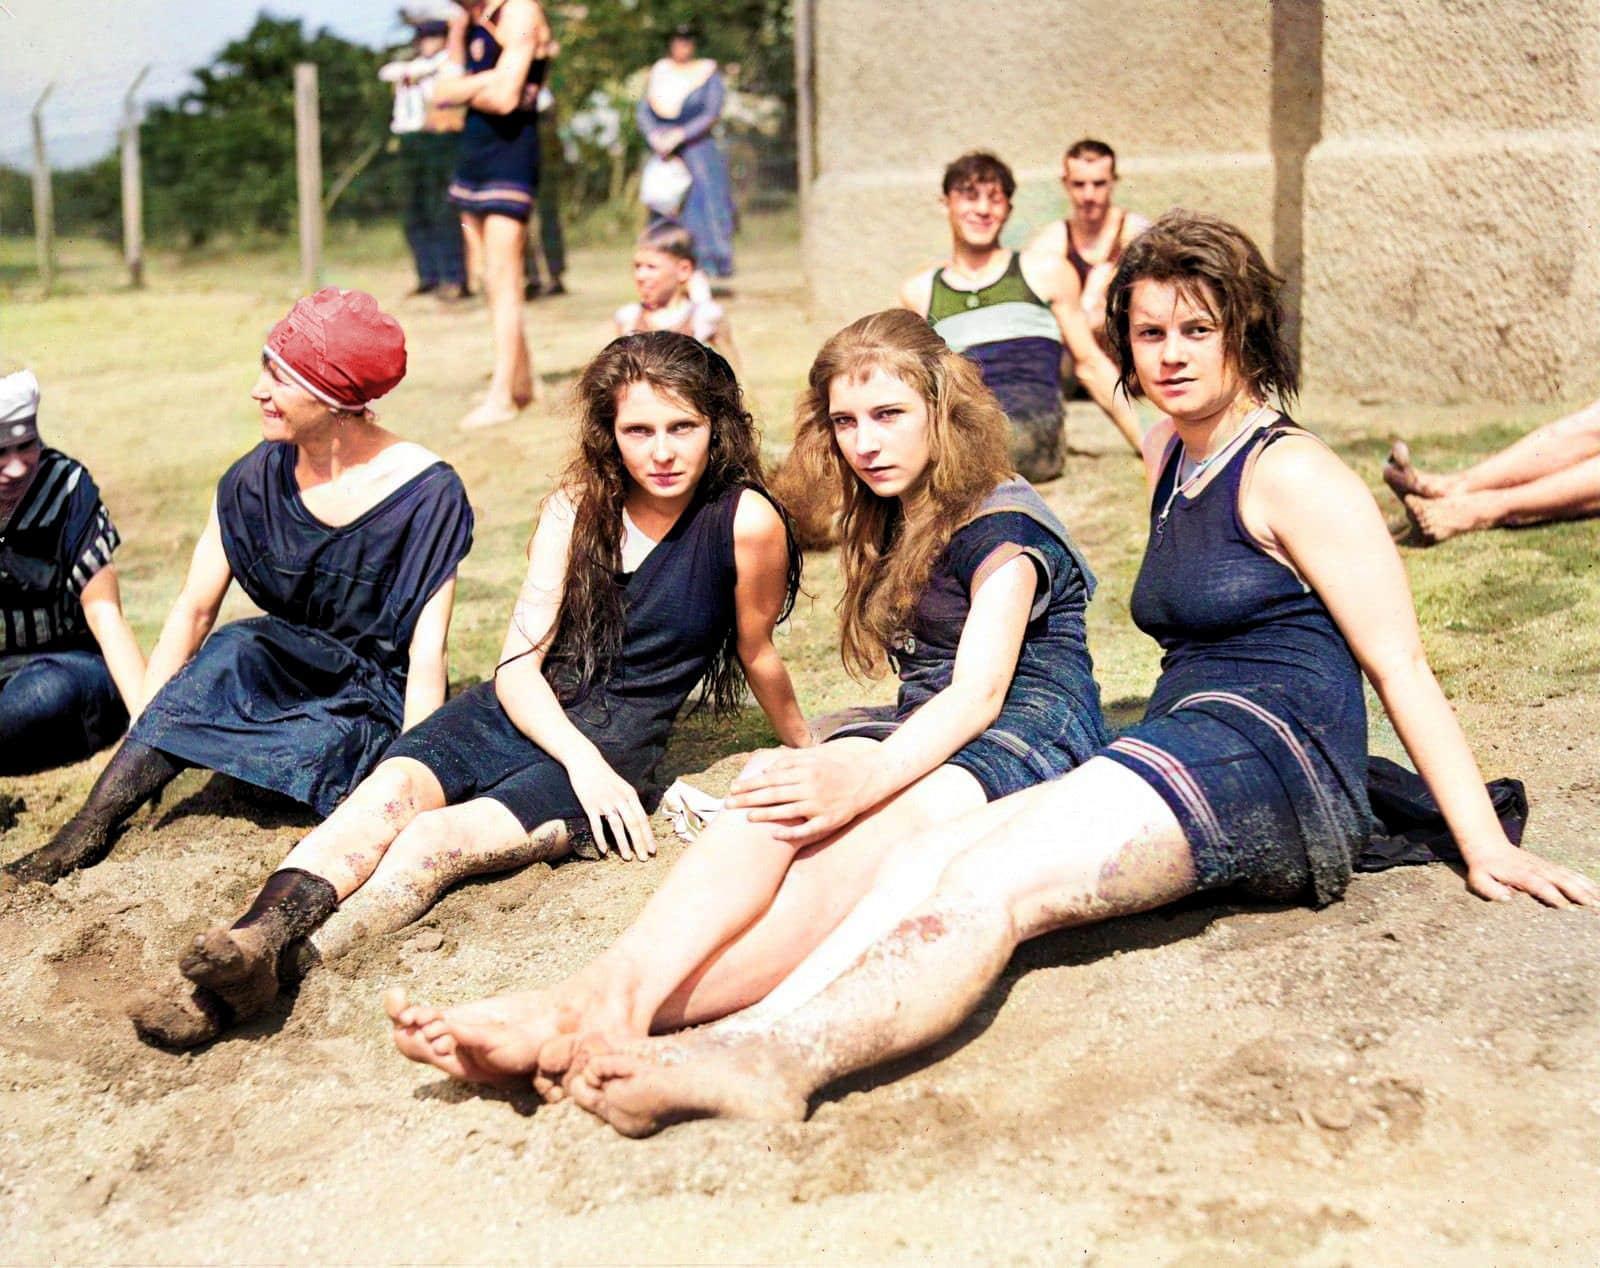 Vintage teens at a bathing beach (1909)